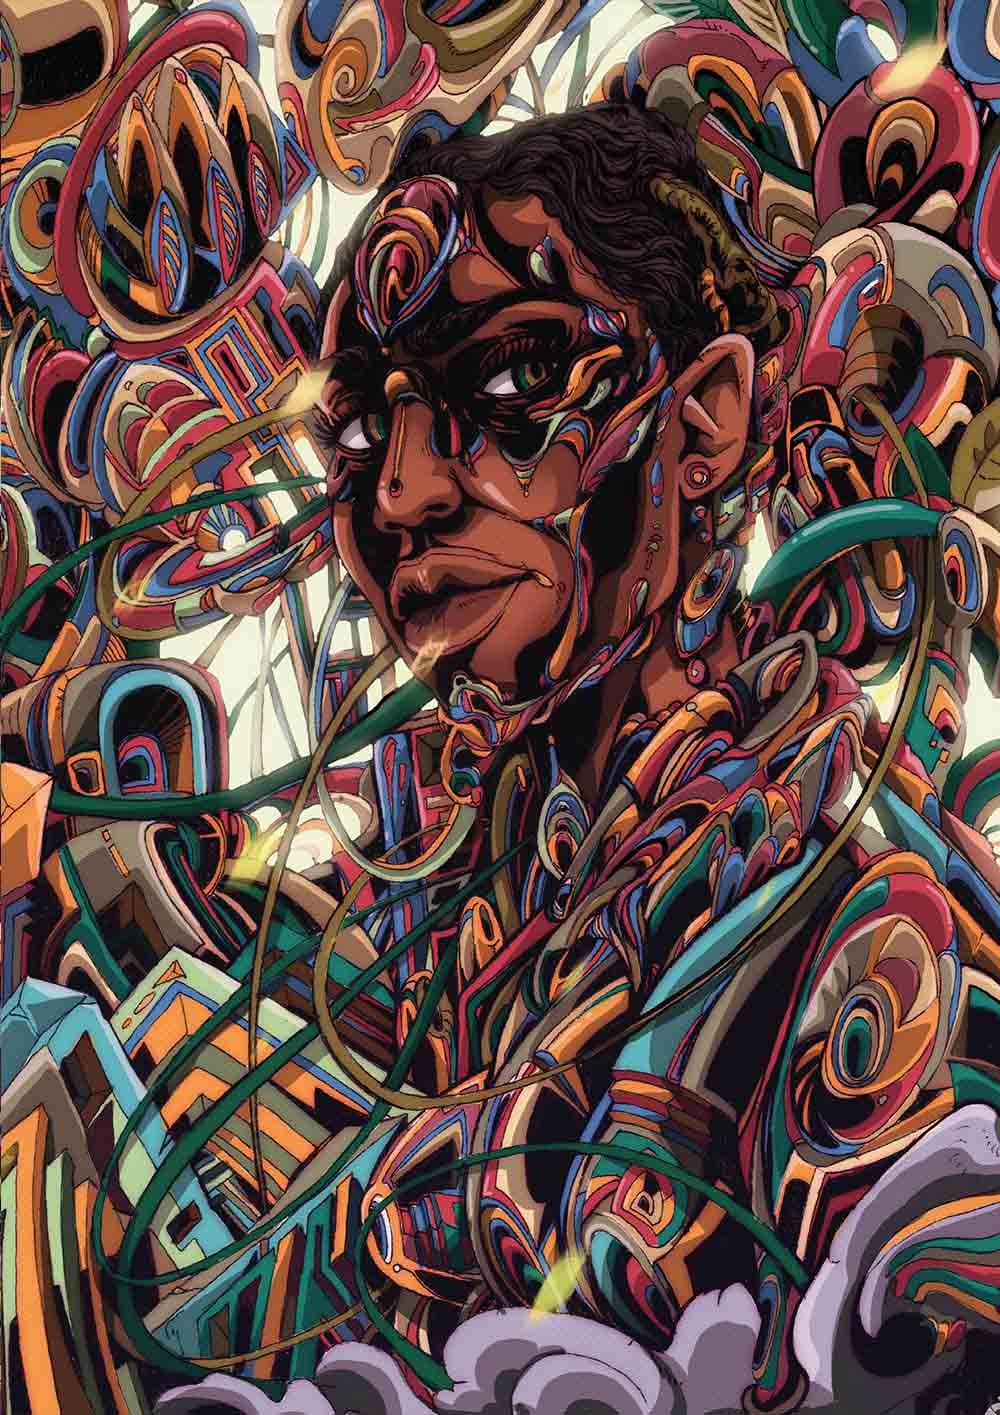 Anda Mncayi, Dreaming-Awake - Awake, 2017. A2 Inkjet, True Fibre